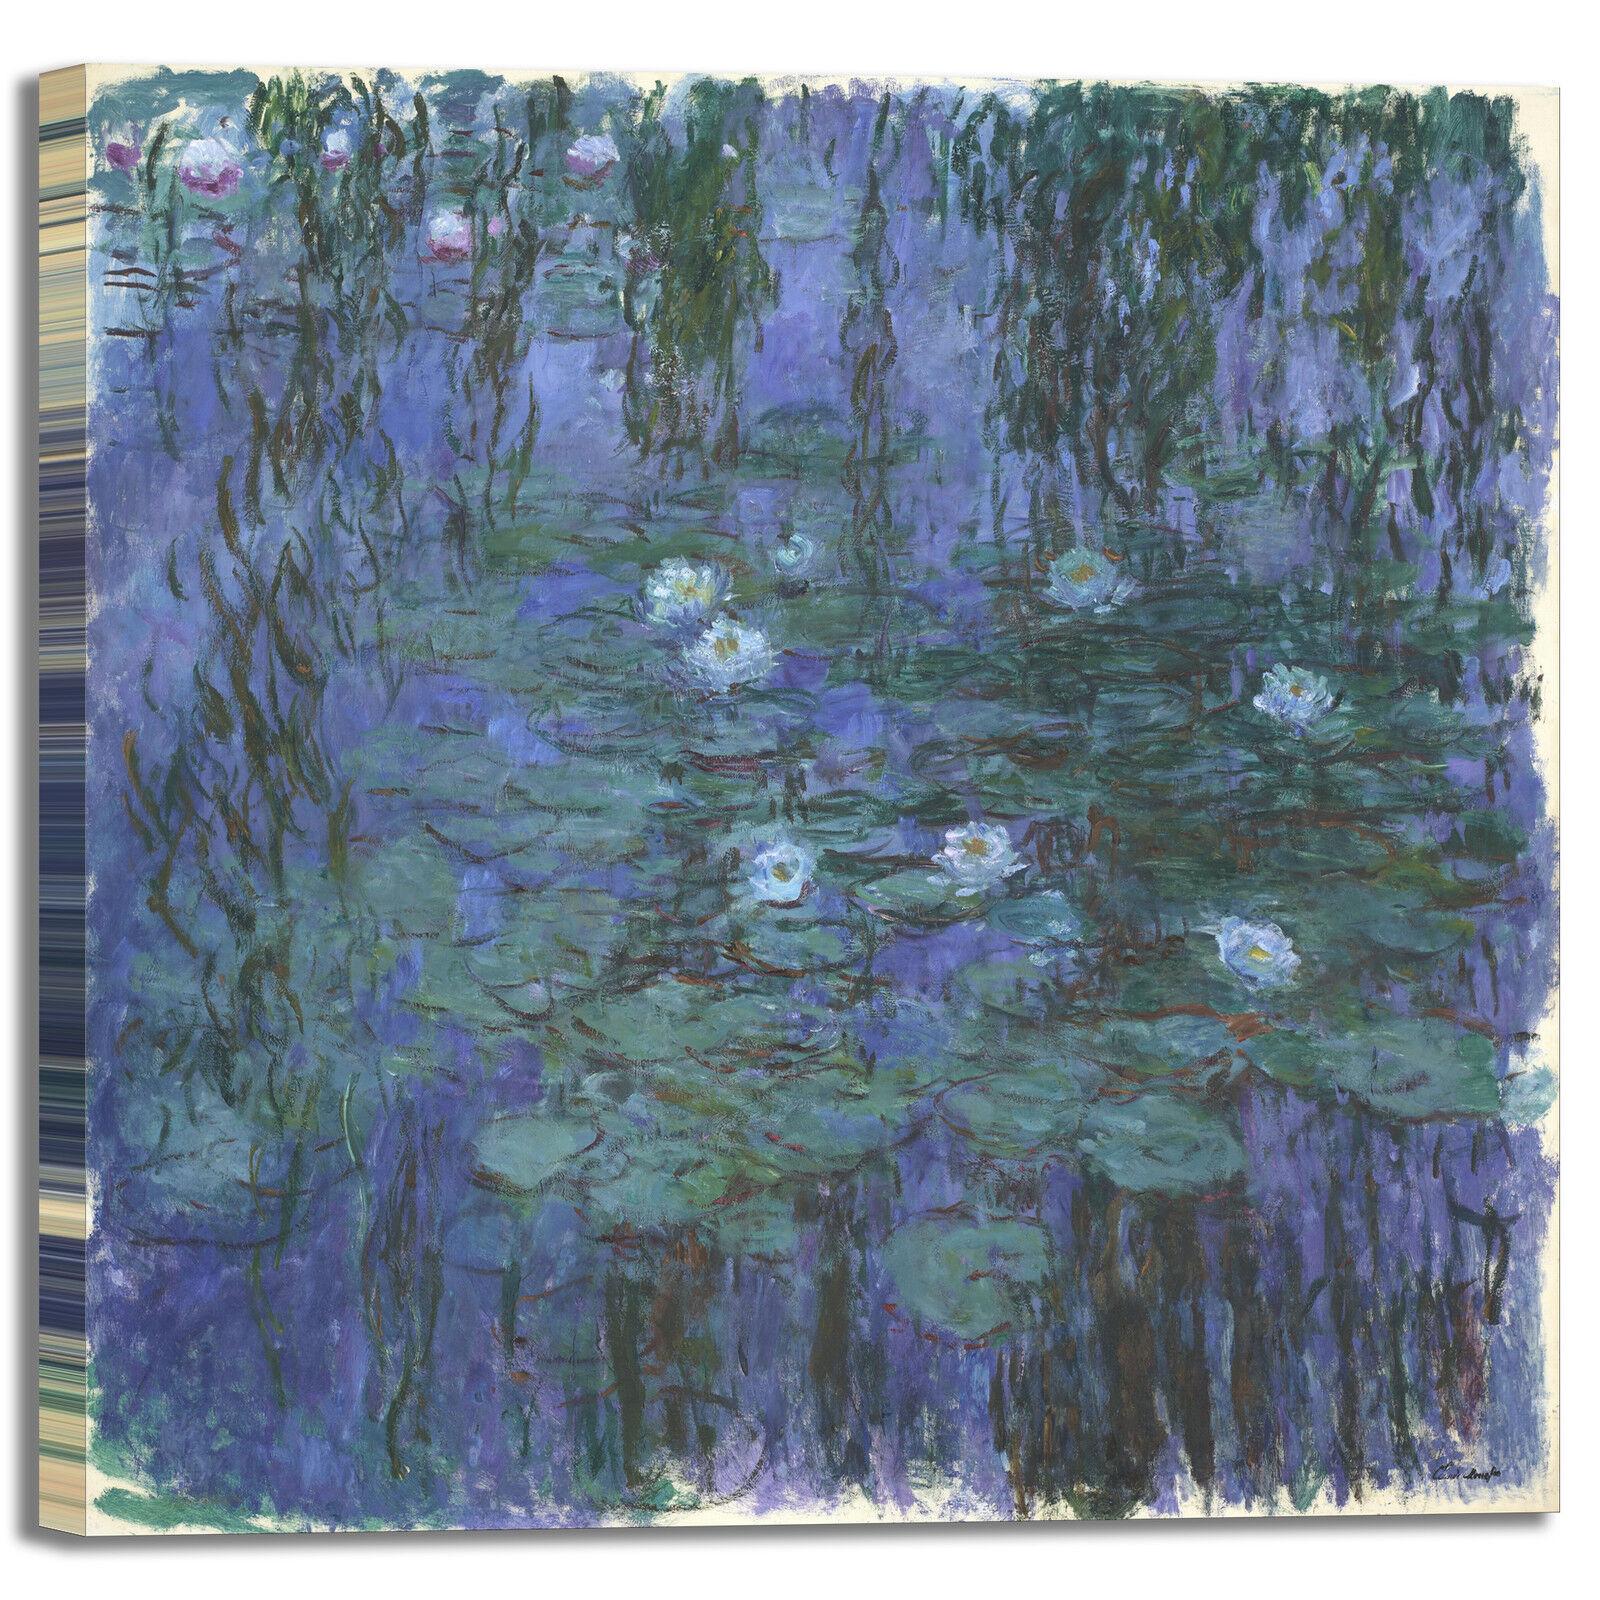 Monet ninfee 16 design quadro stampa tela dipinto telaio arroto casa